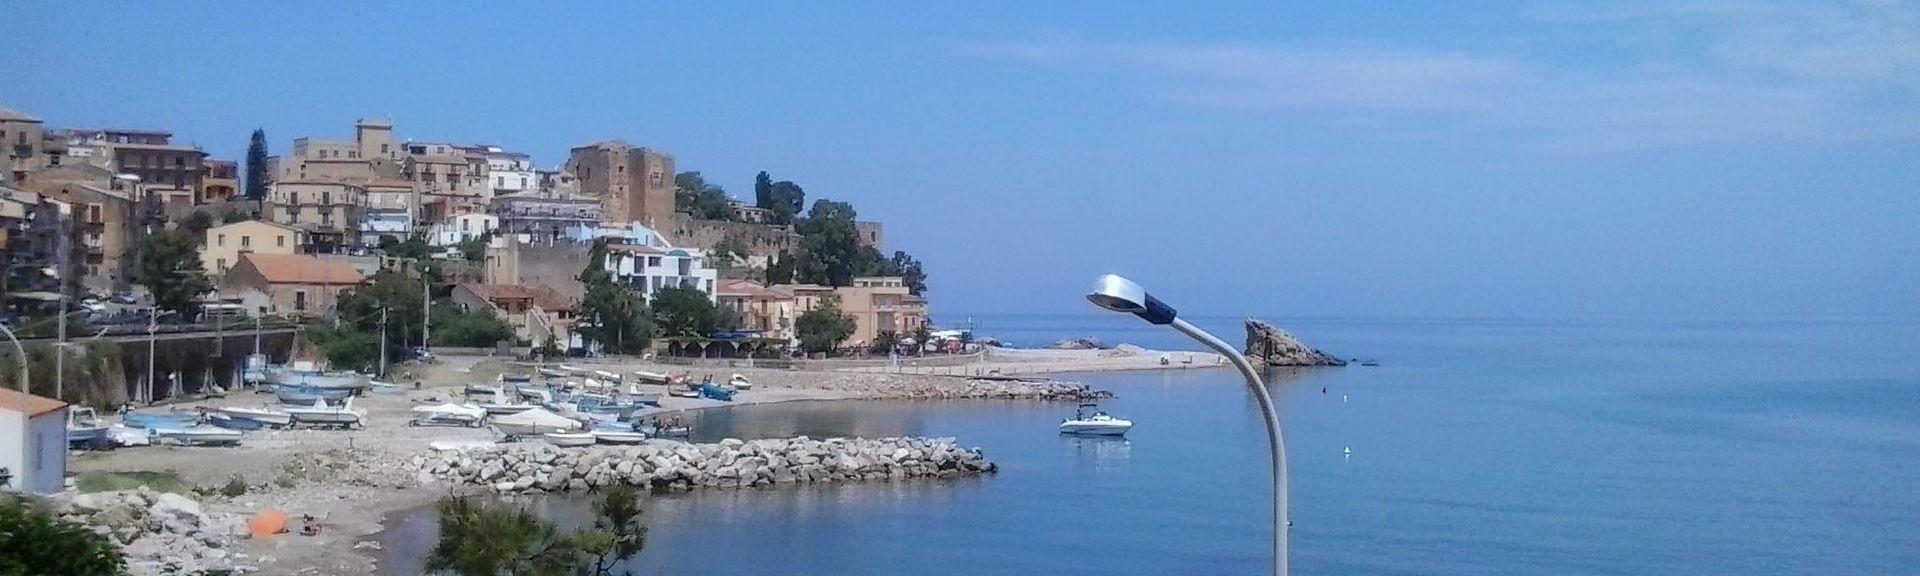 Pettineo, Sicile, Italie